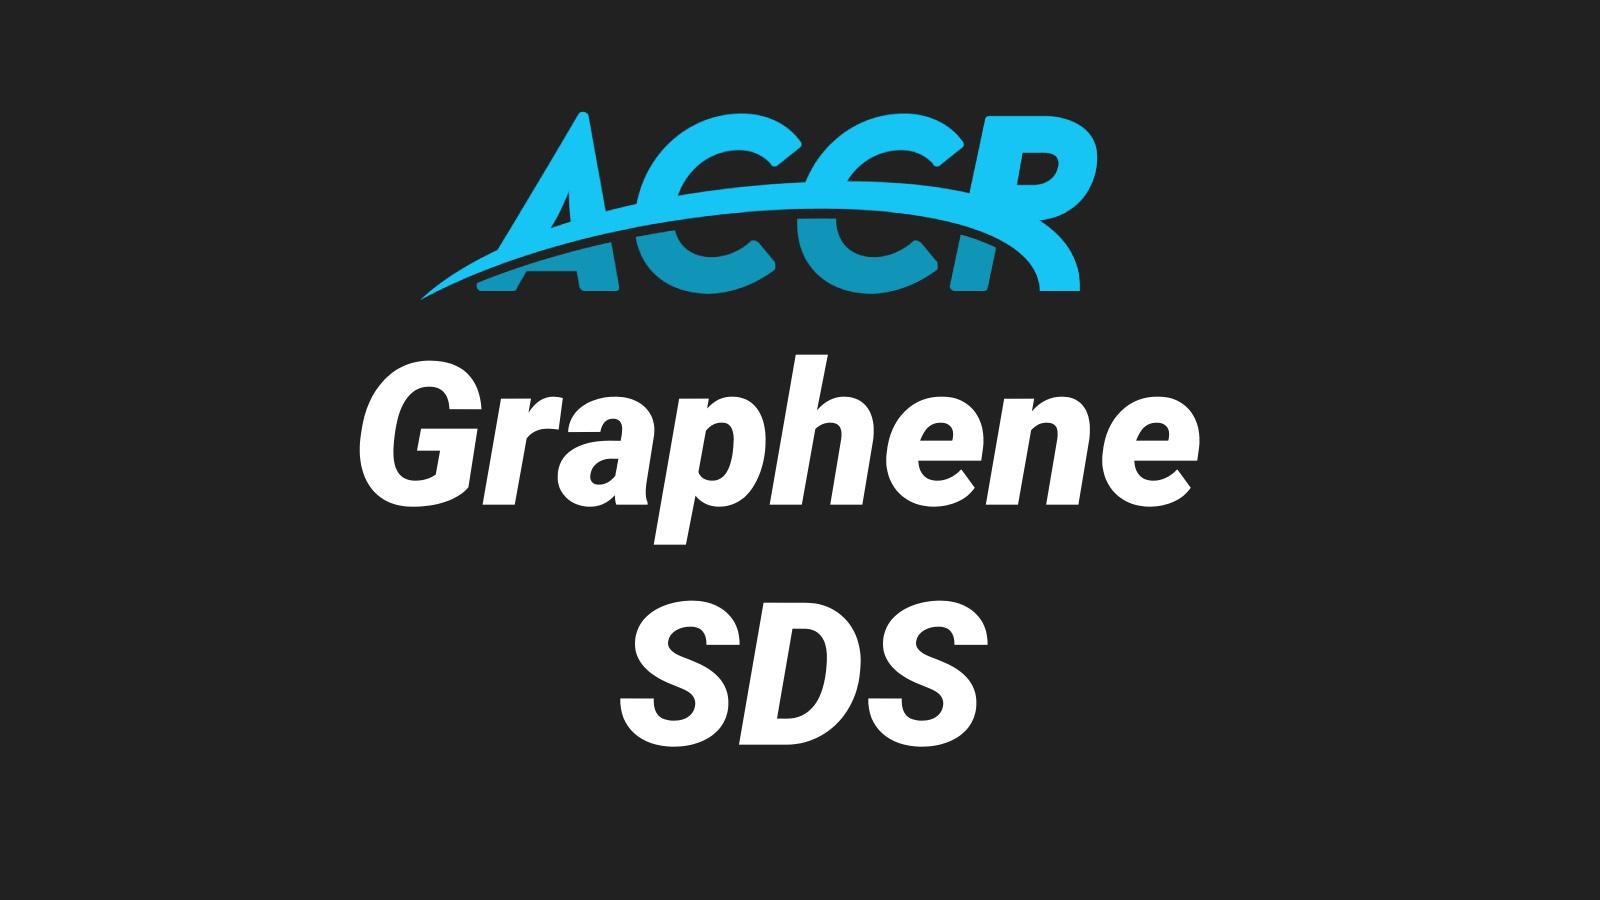 Graphene Material Safety Data Sheet (SDS)